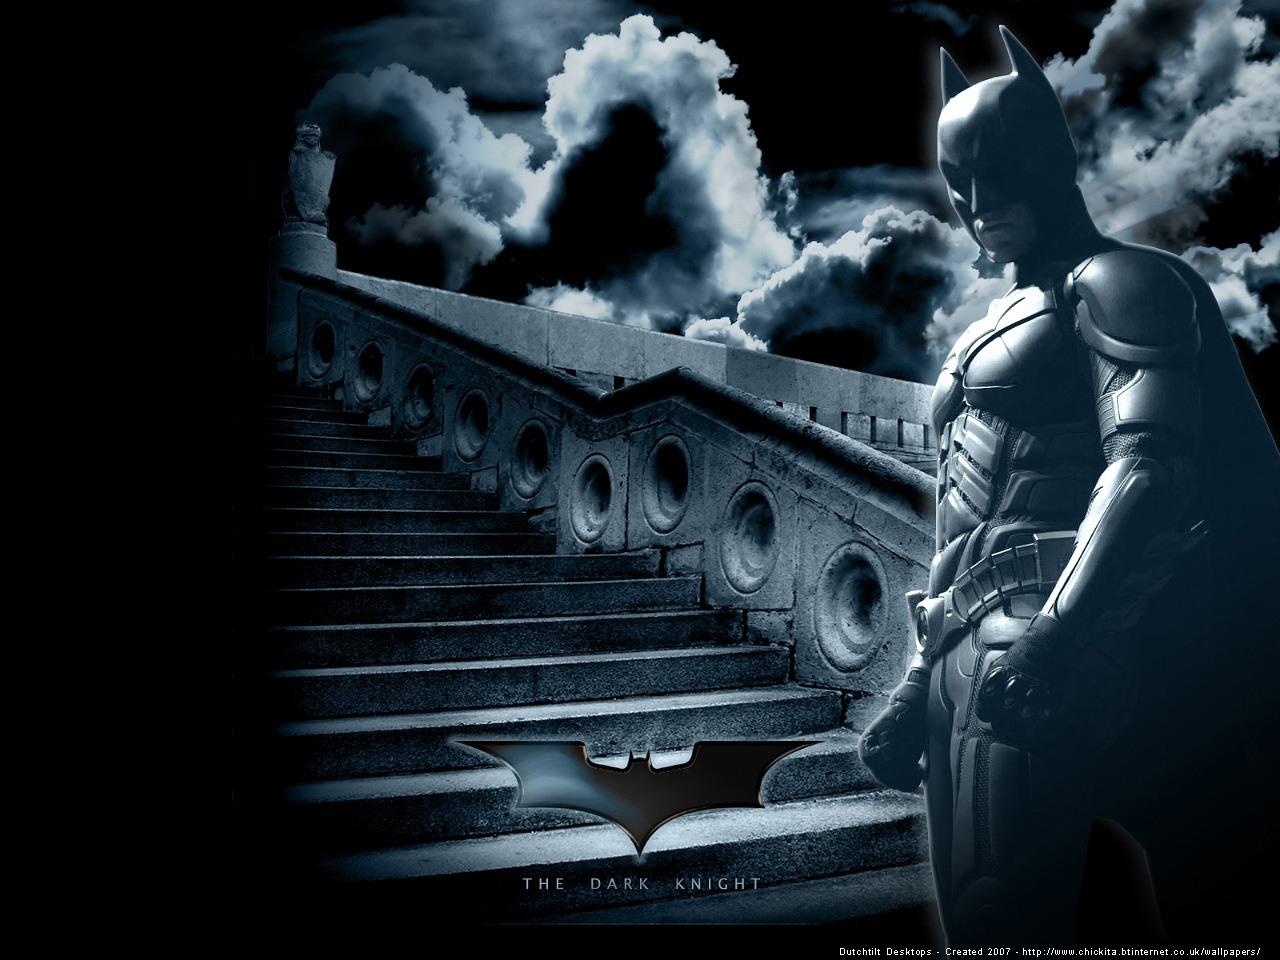 Batman dark knight wallpapers hd Funny amp Amazing Images 1280x960